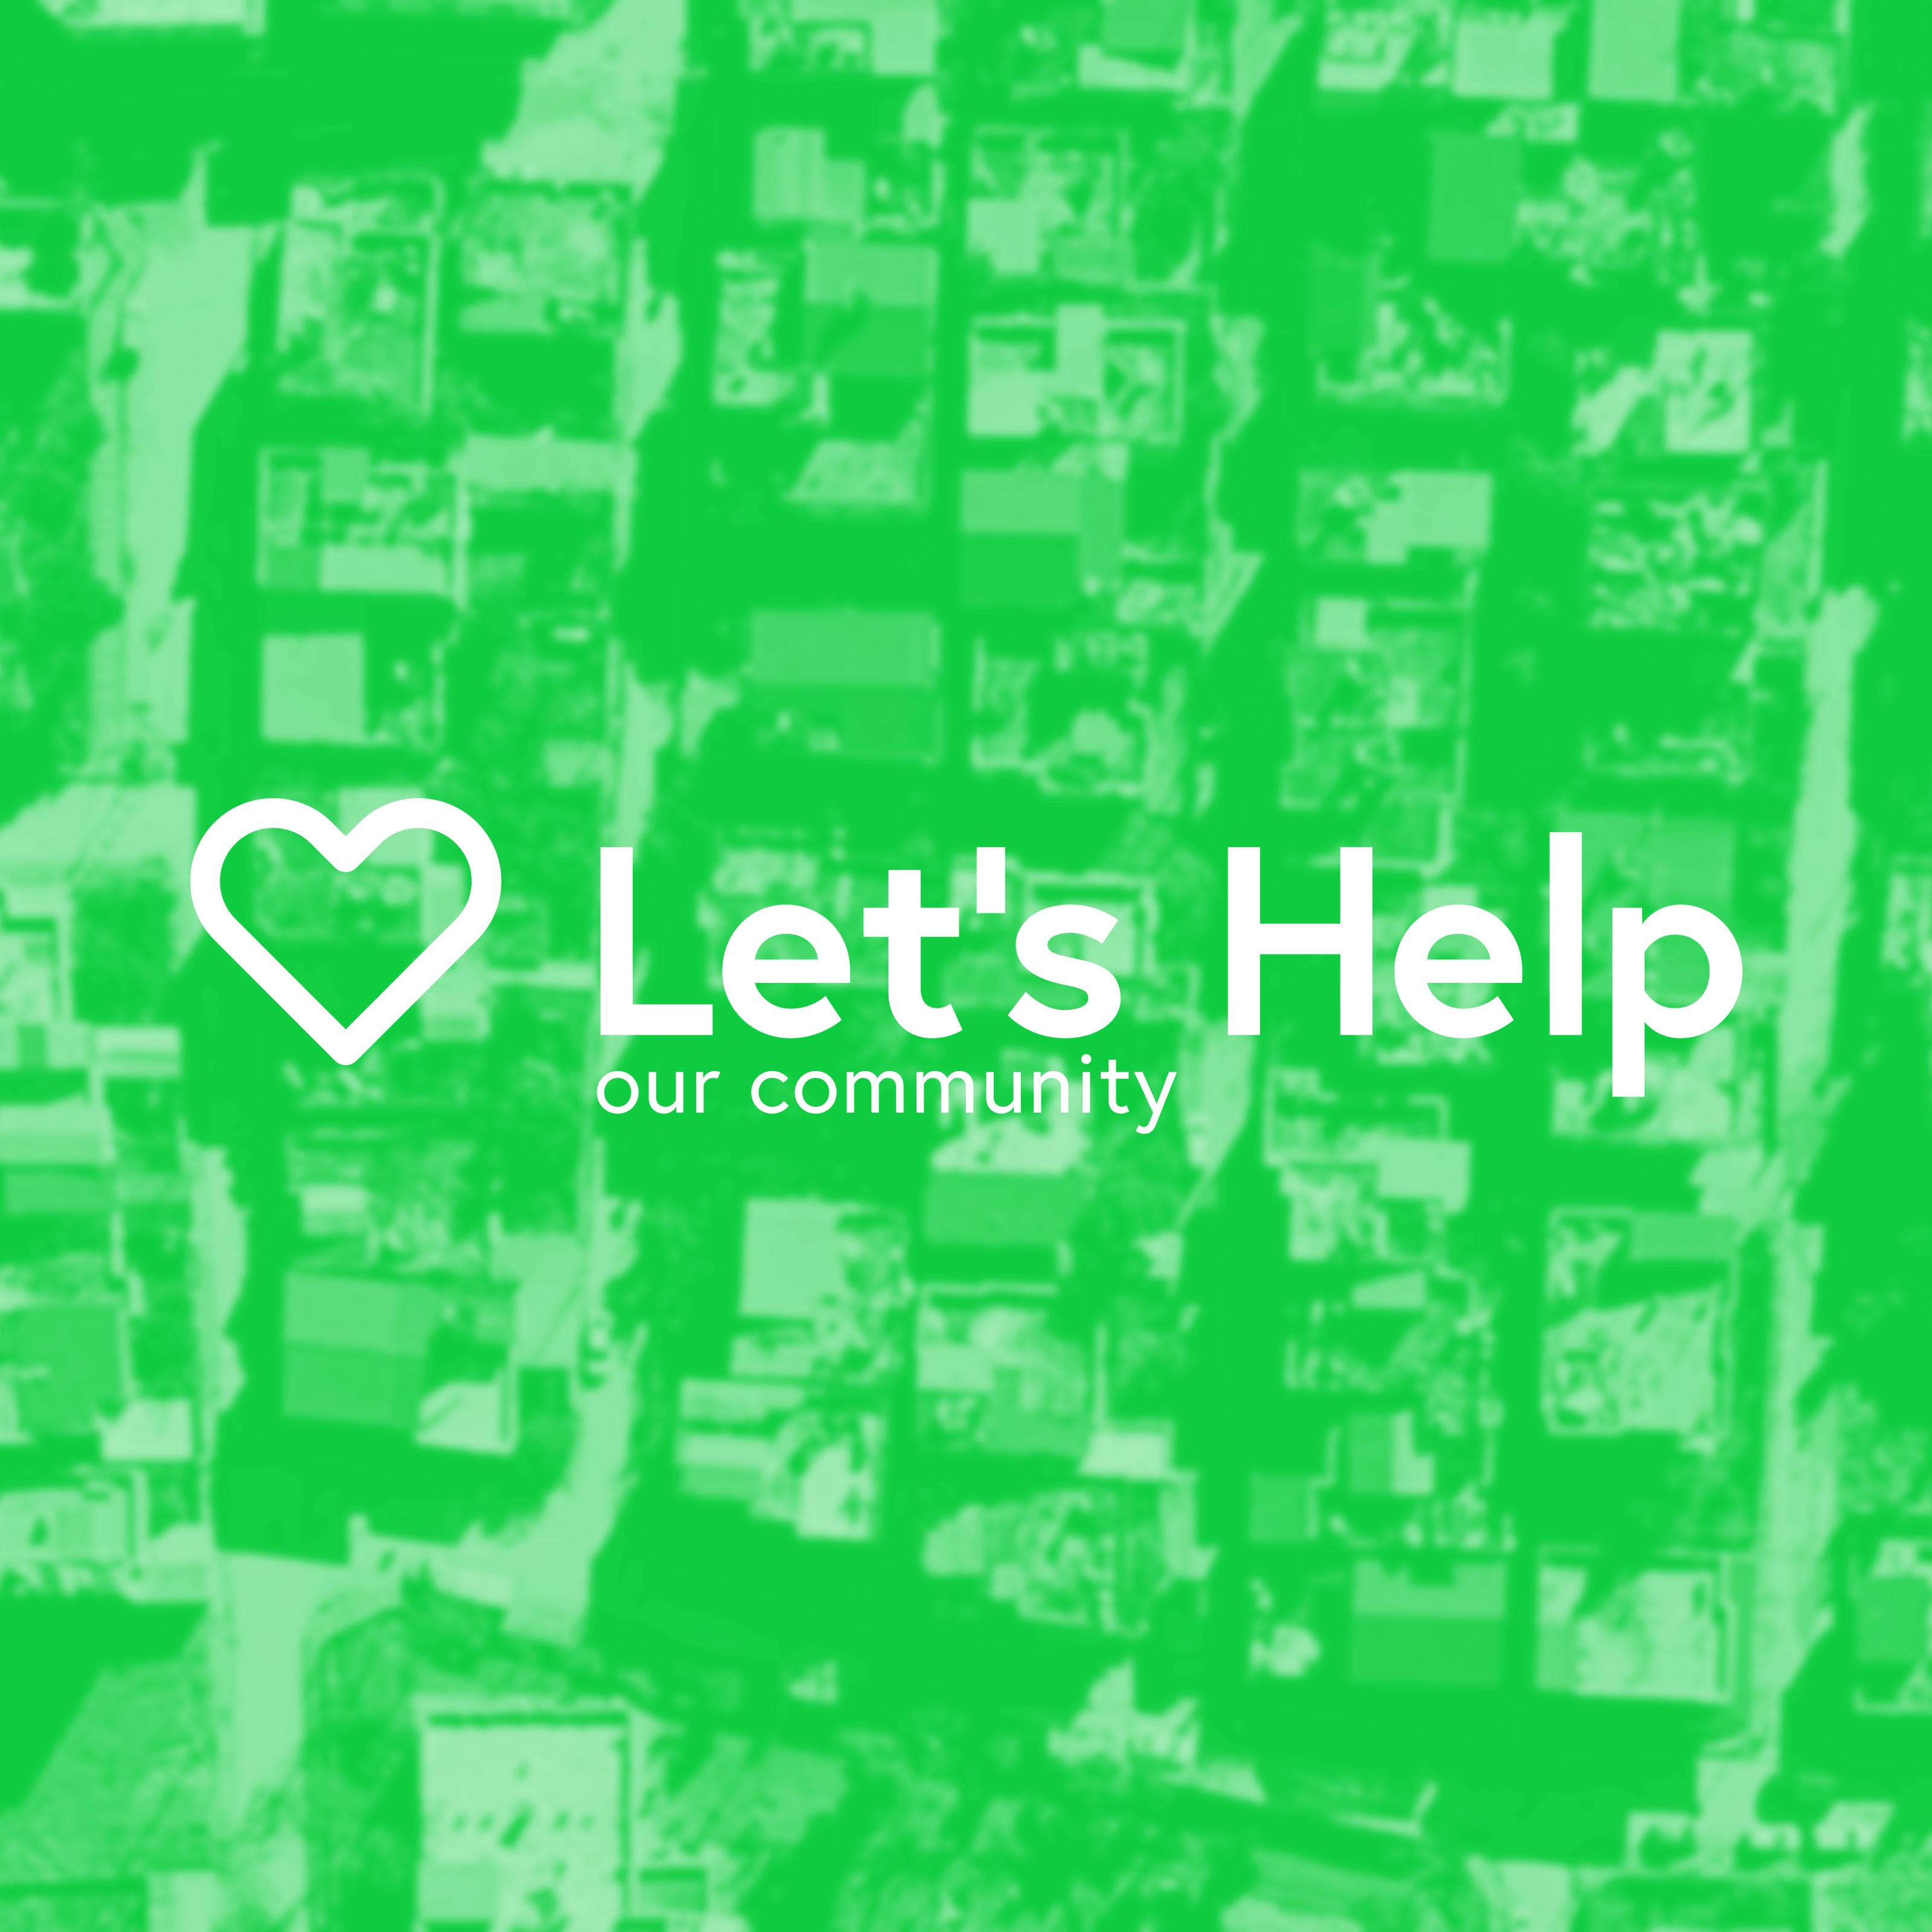 Let s help photo community square